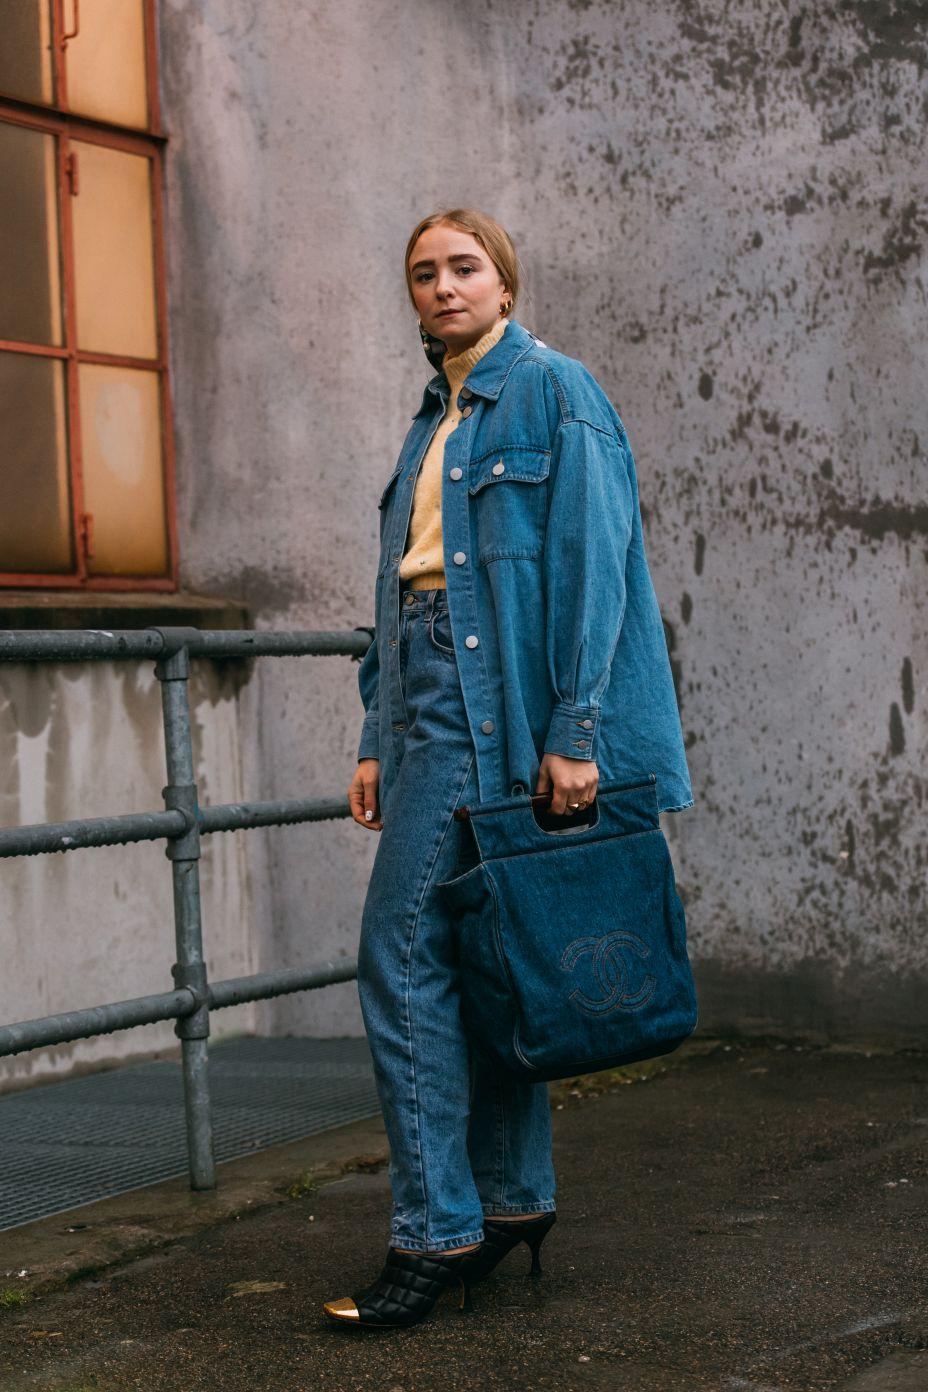 Fanny Ekstrand, Bottega Veneta, copenhagen fashion week, street style, cfw, aw20, fall 2020